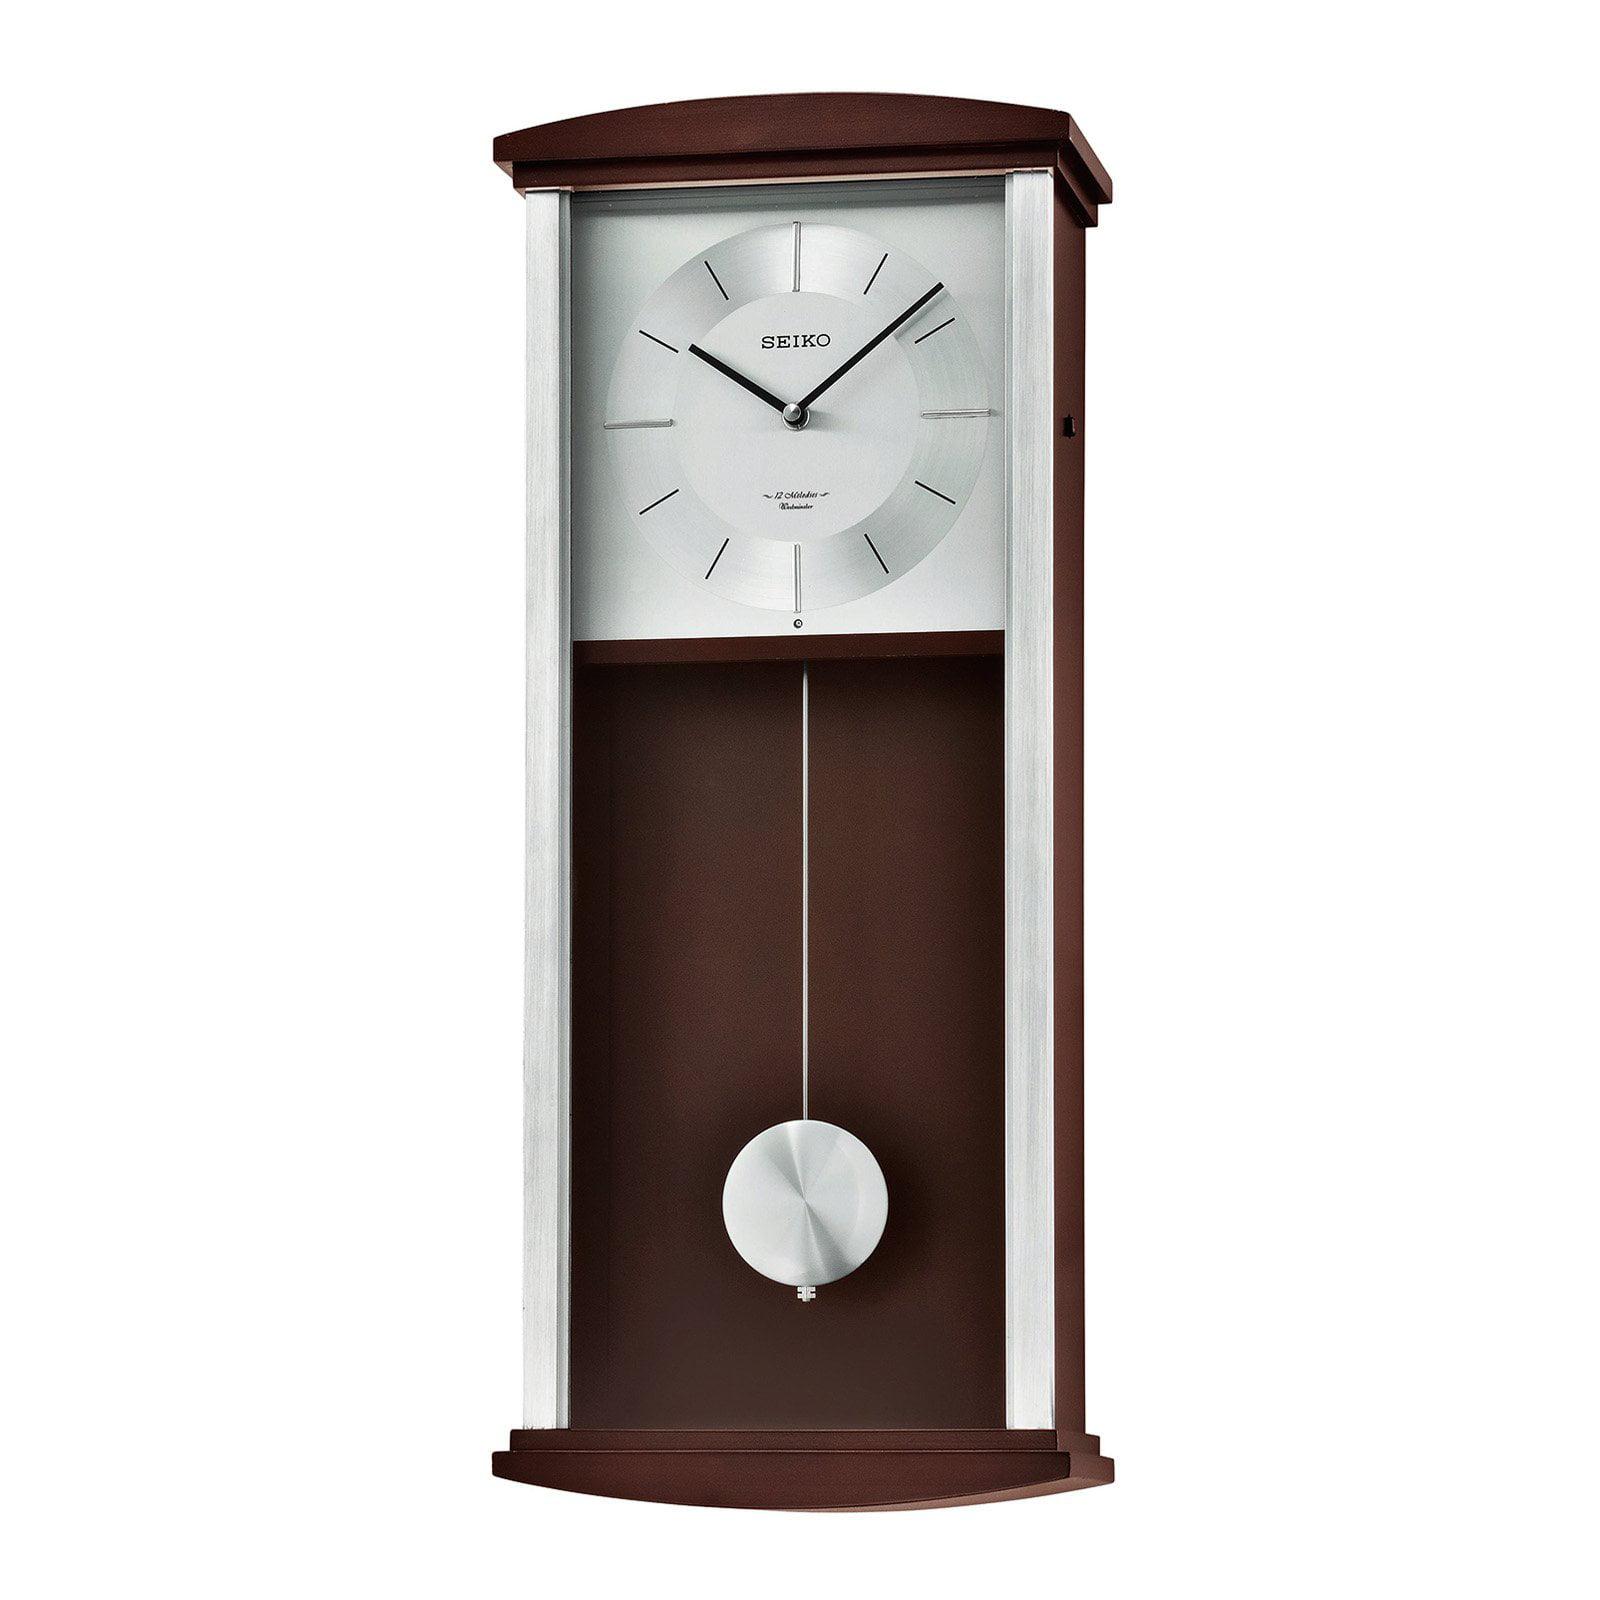 Seiko Rothesay Wall Clock With Pendulum